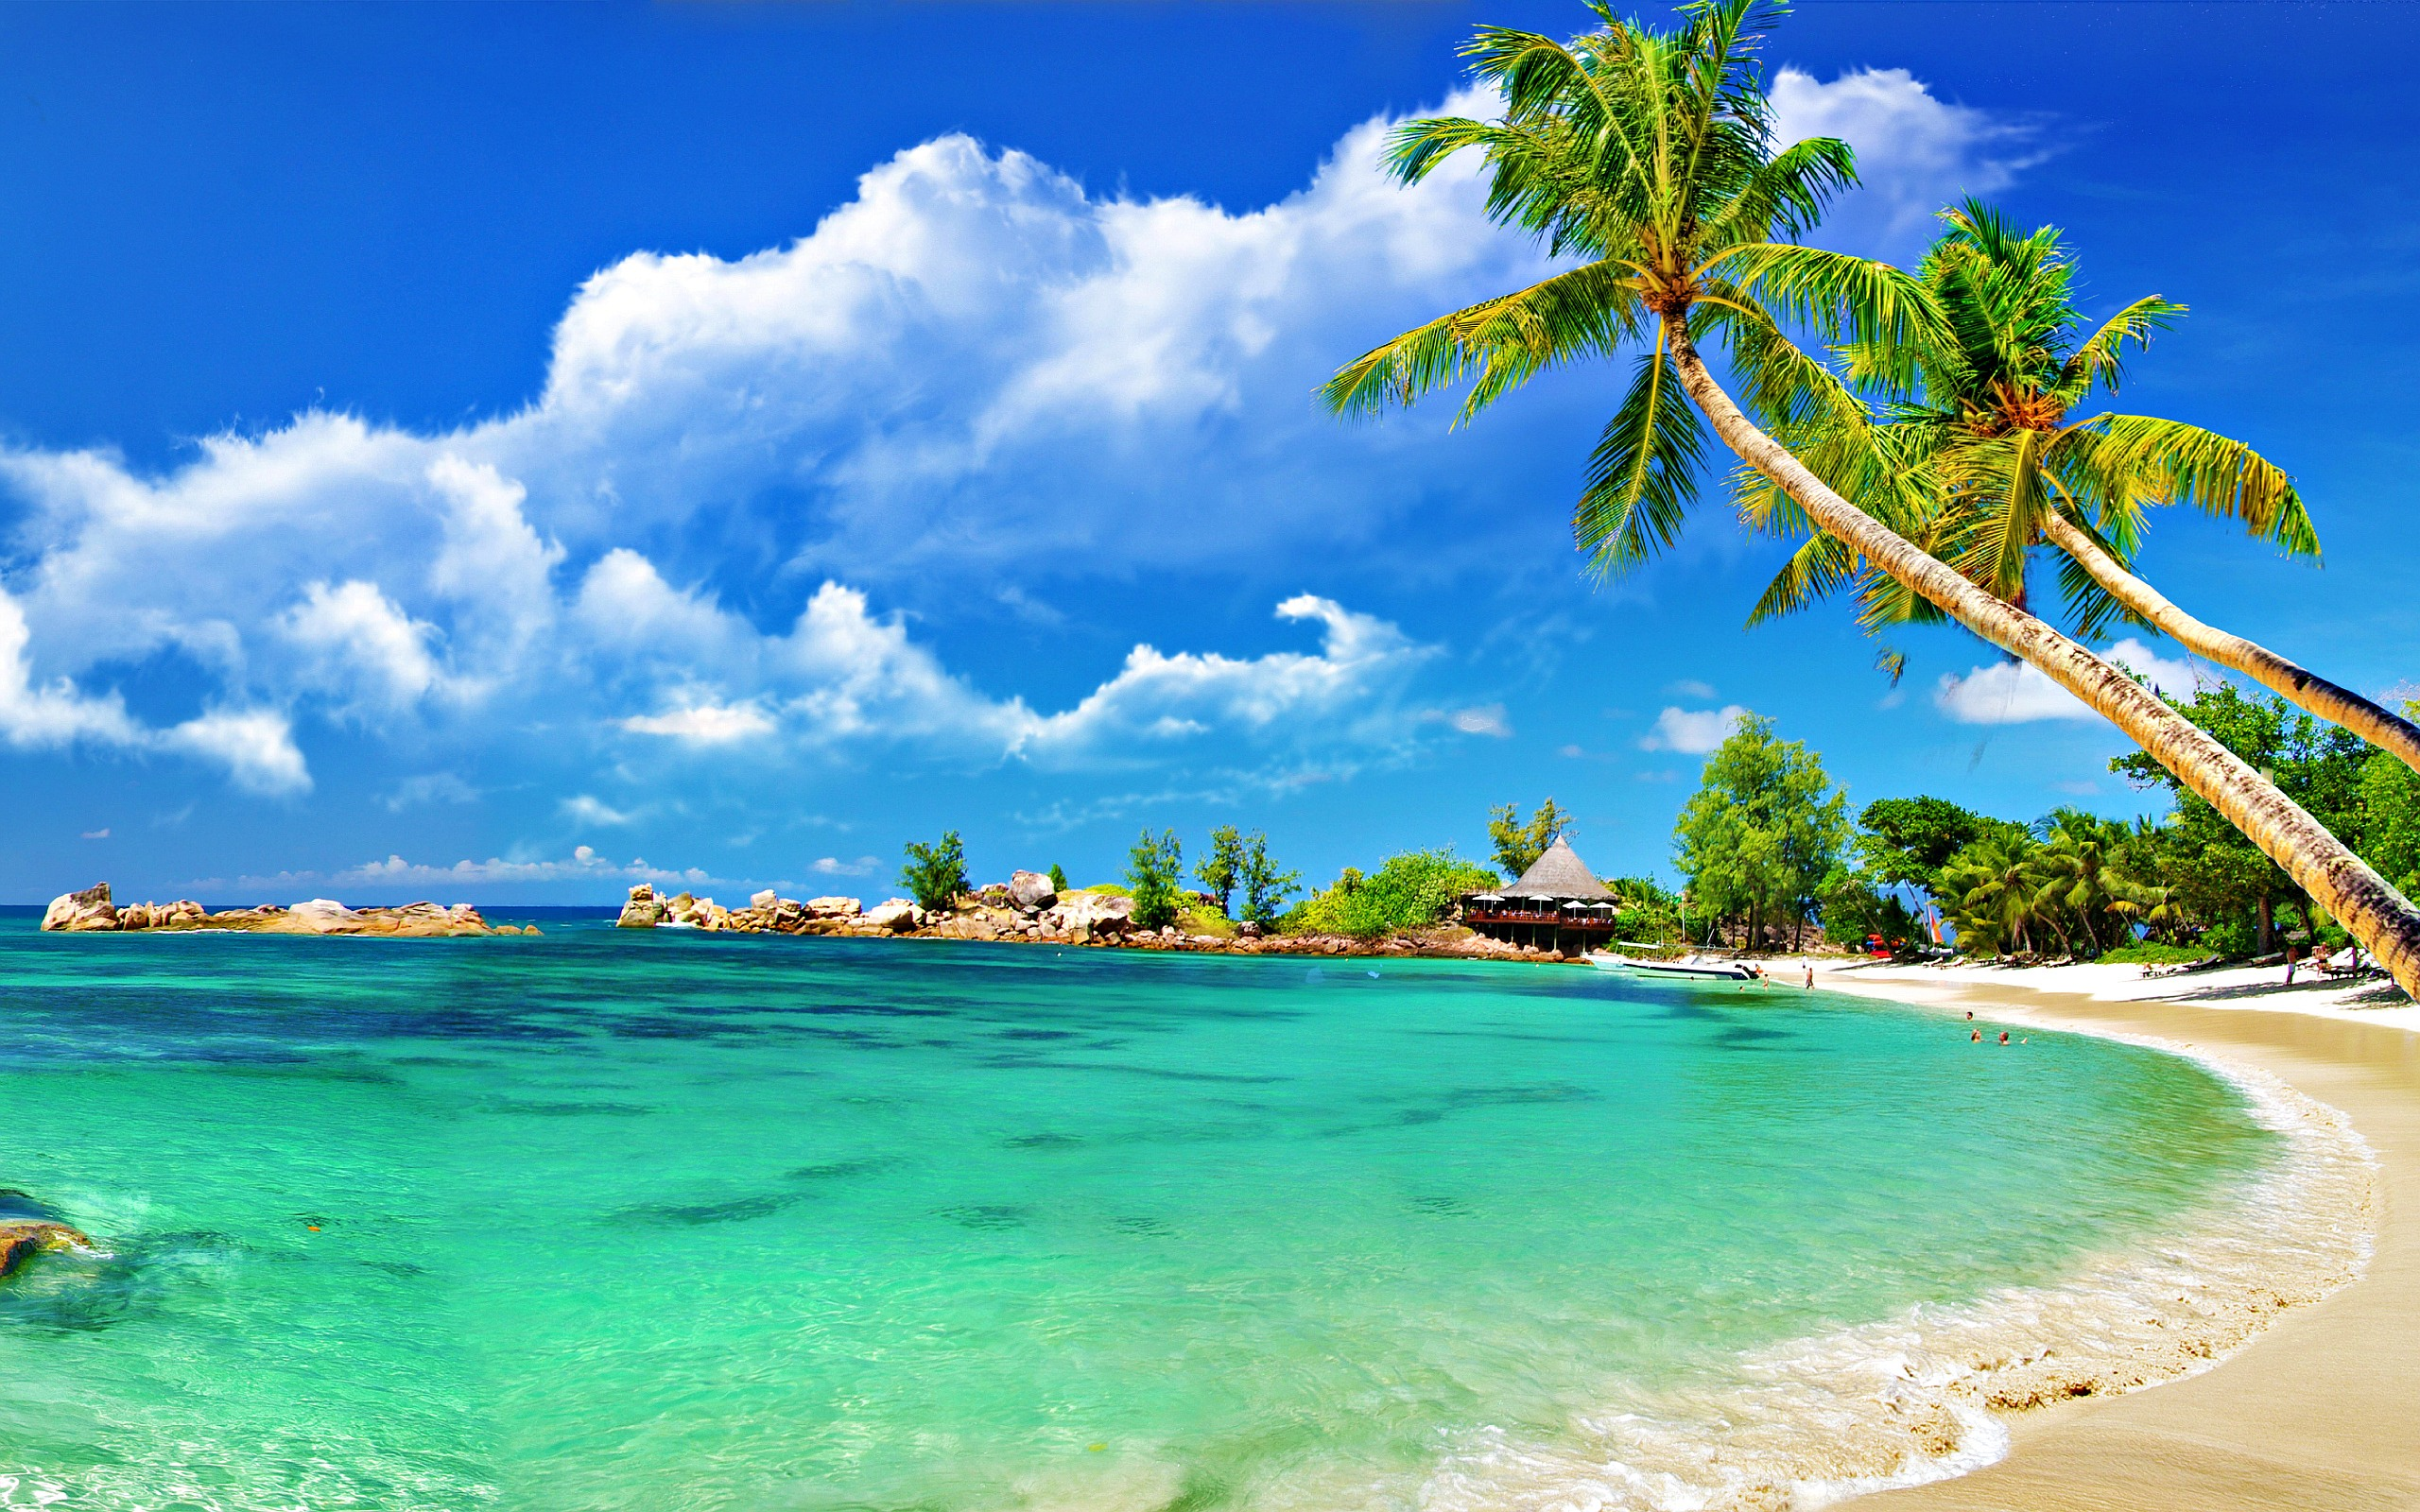 Tropics beach